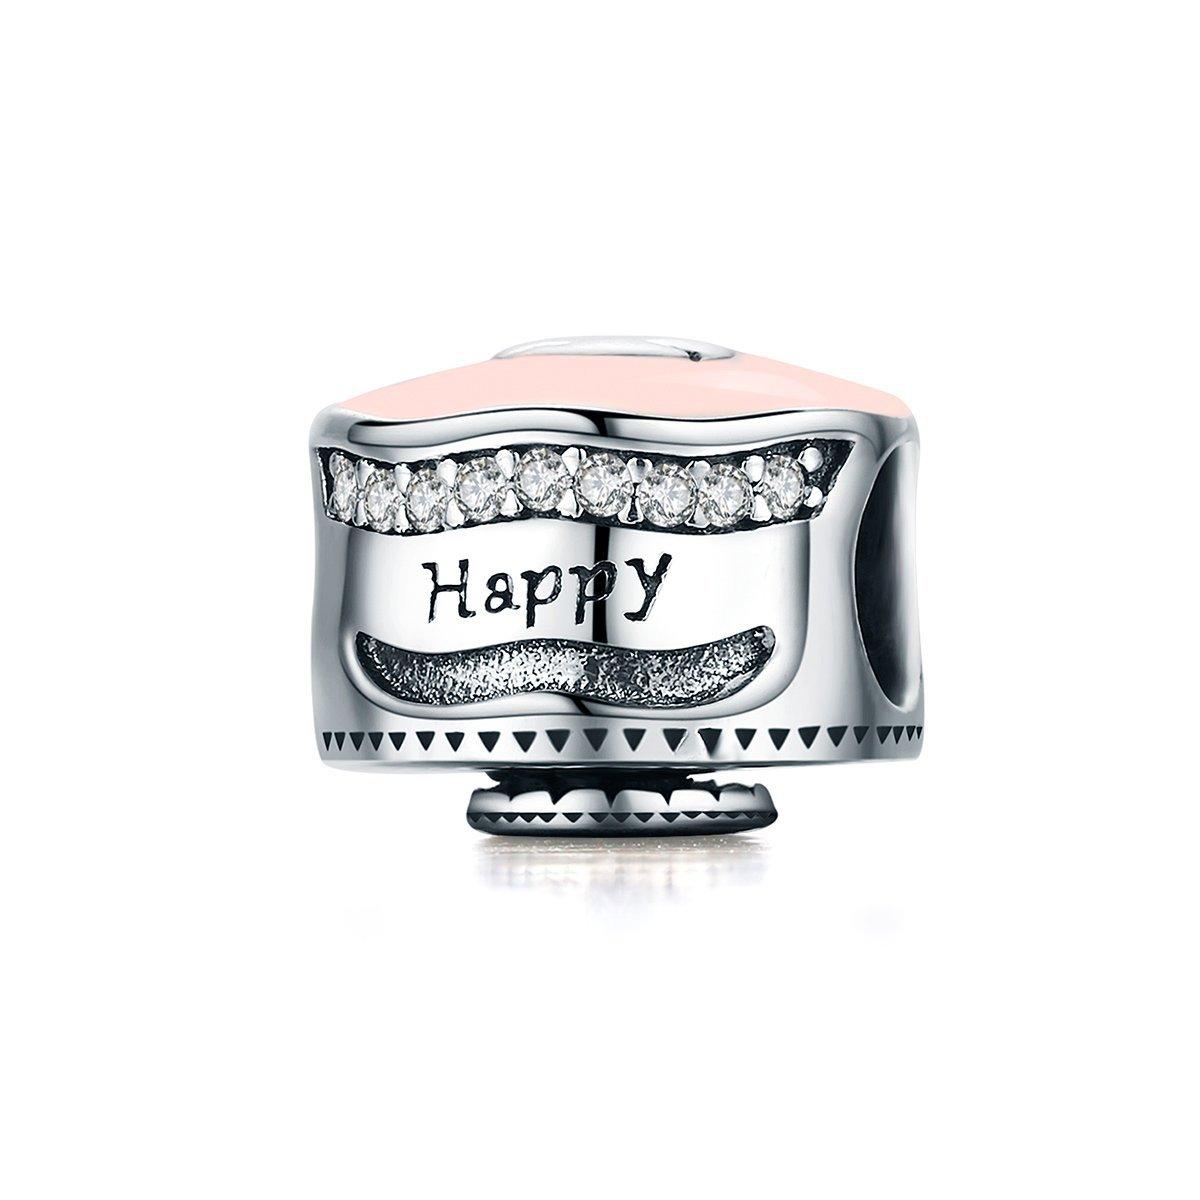 The Kiss Happy Birthday Cake Pink Enamel 925 Sterling Silver Bead Fits European Charm Bracelet